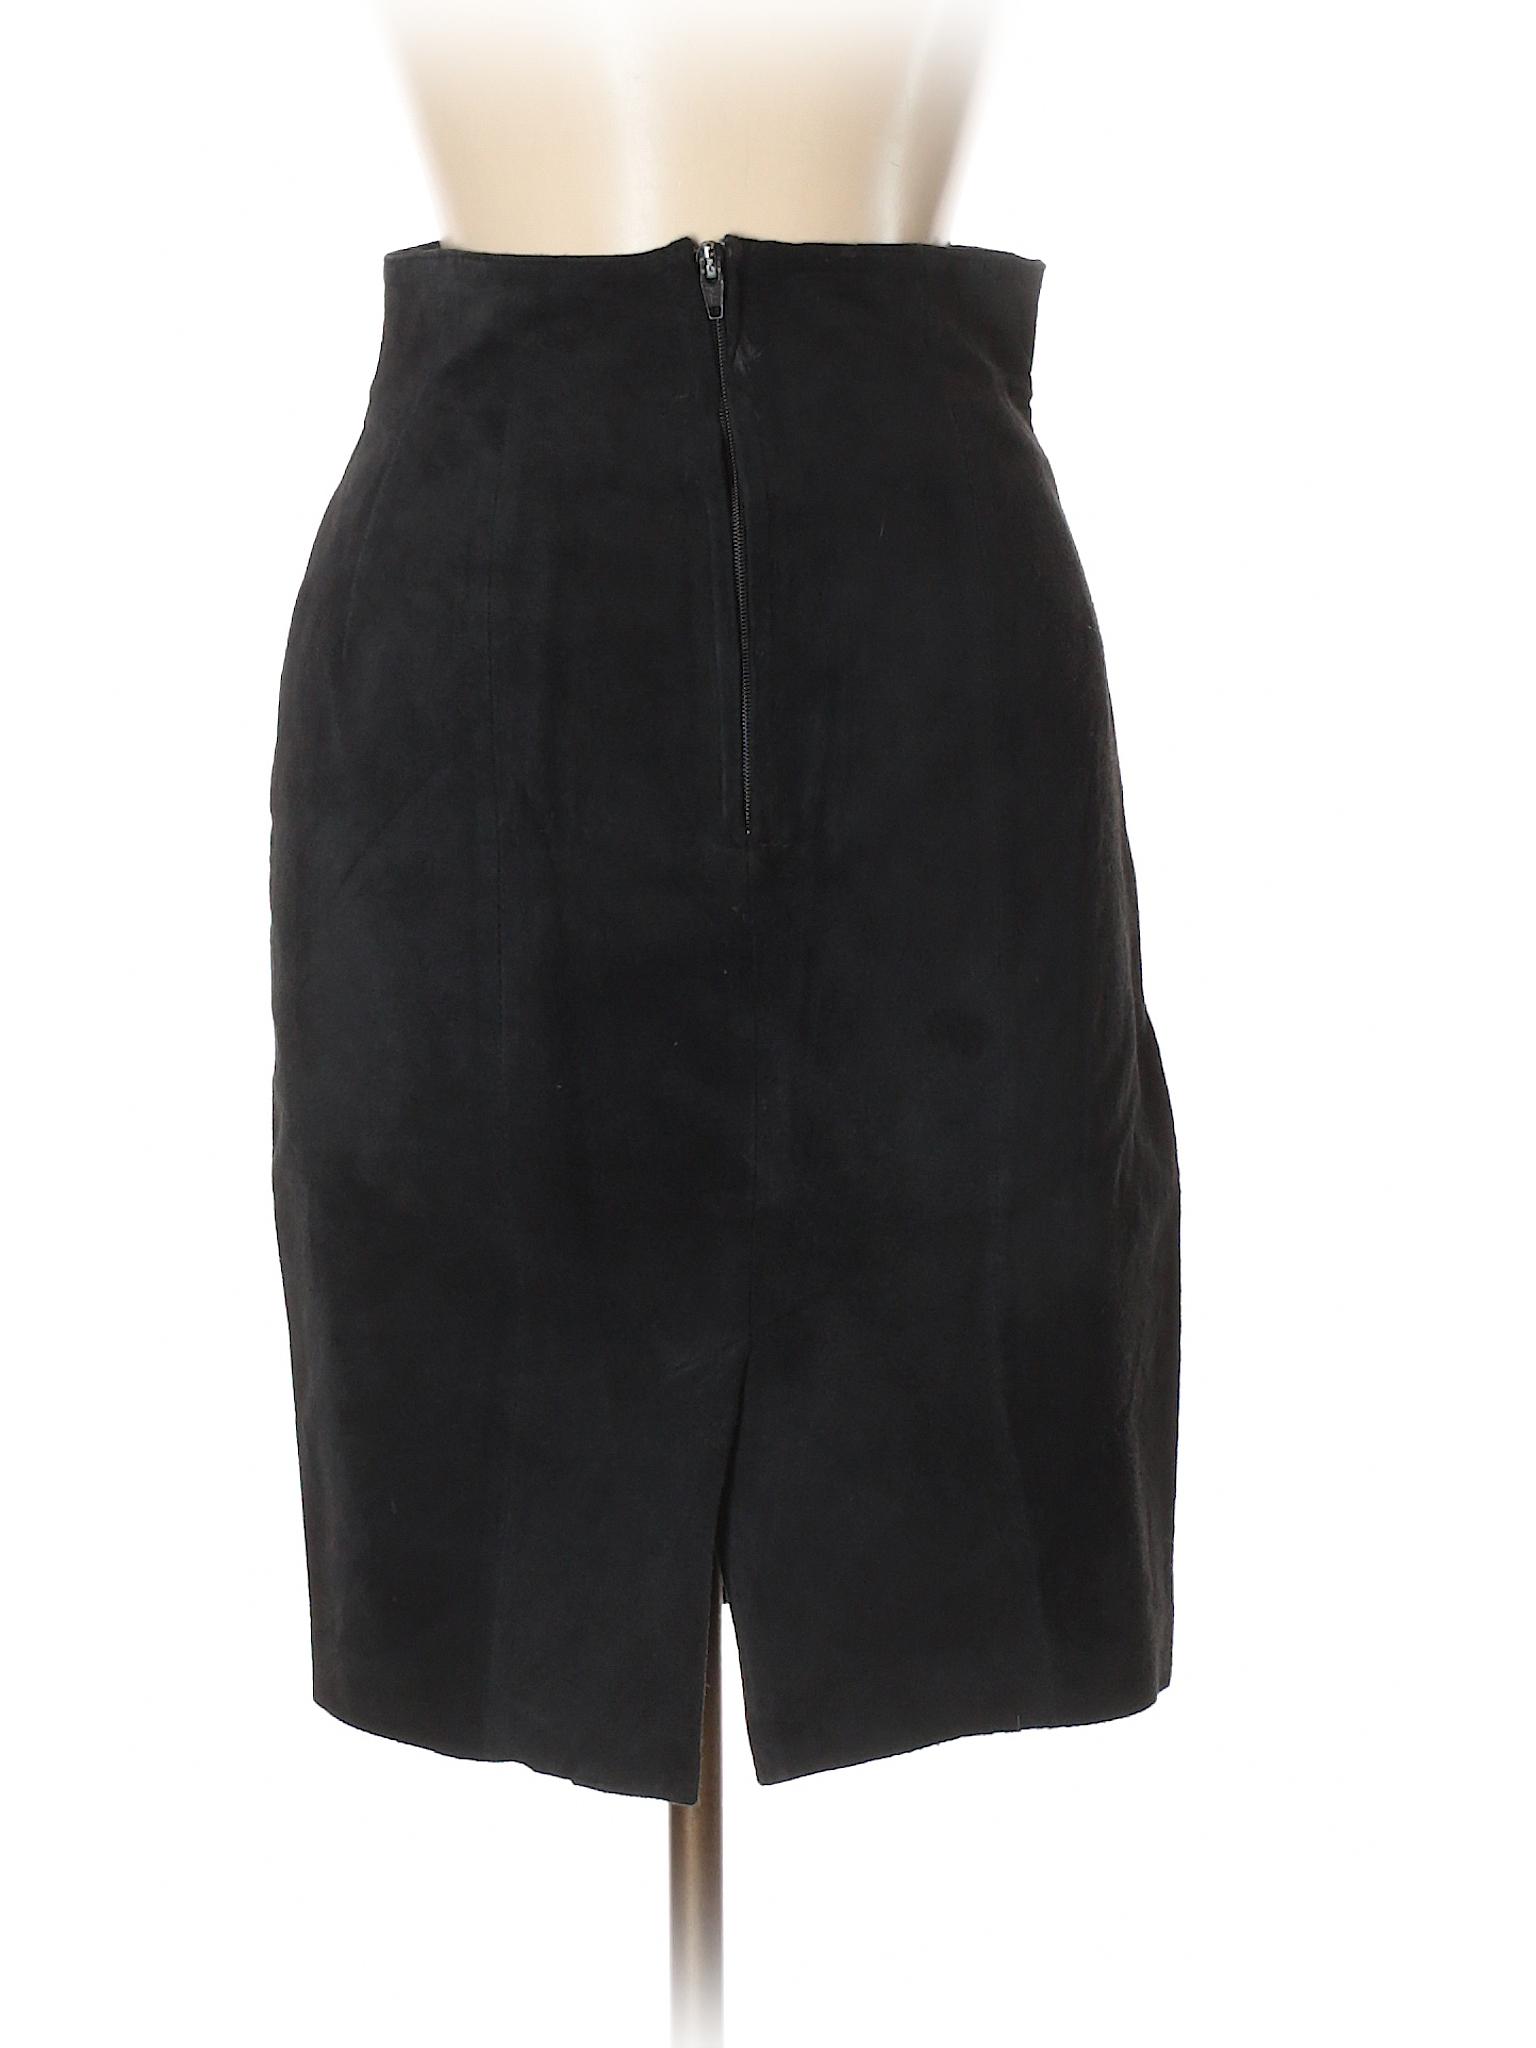 Boutique Leather Boutique Skirt Boutique Leather Leather Boutique Skirt Skirt SwnqrSR